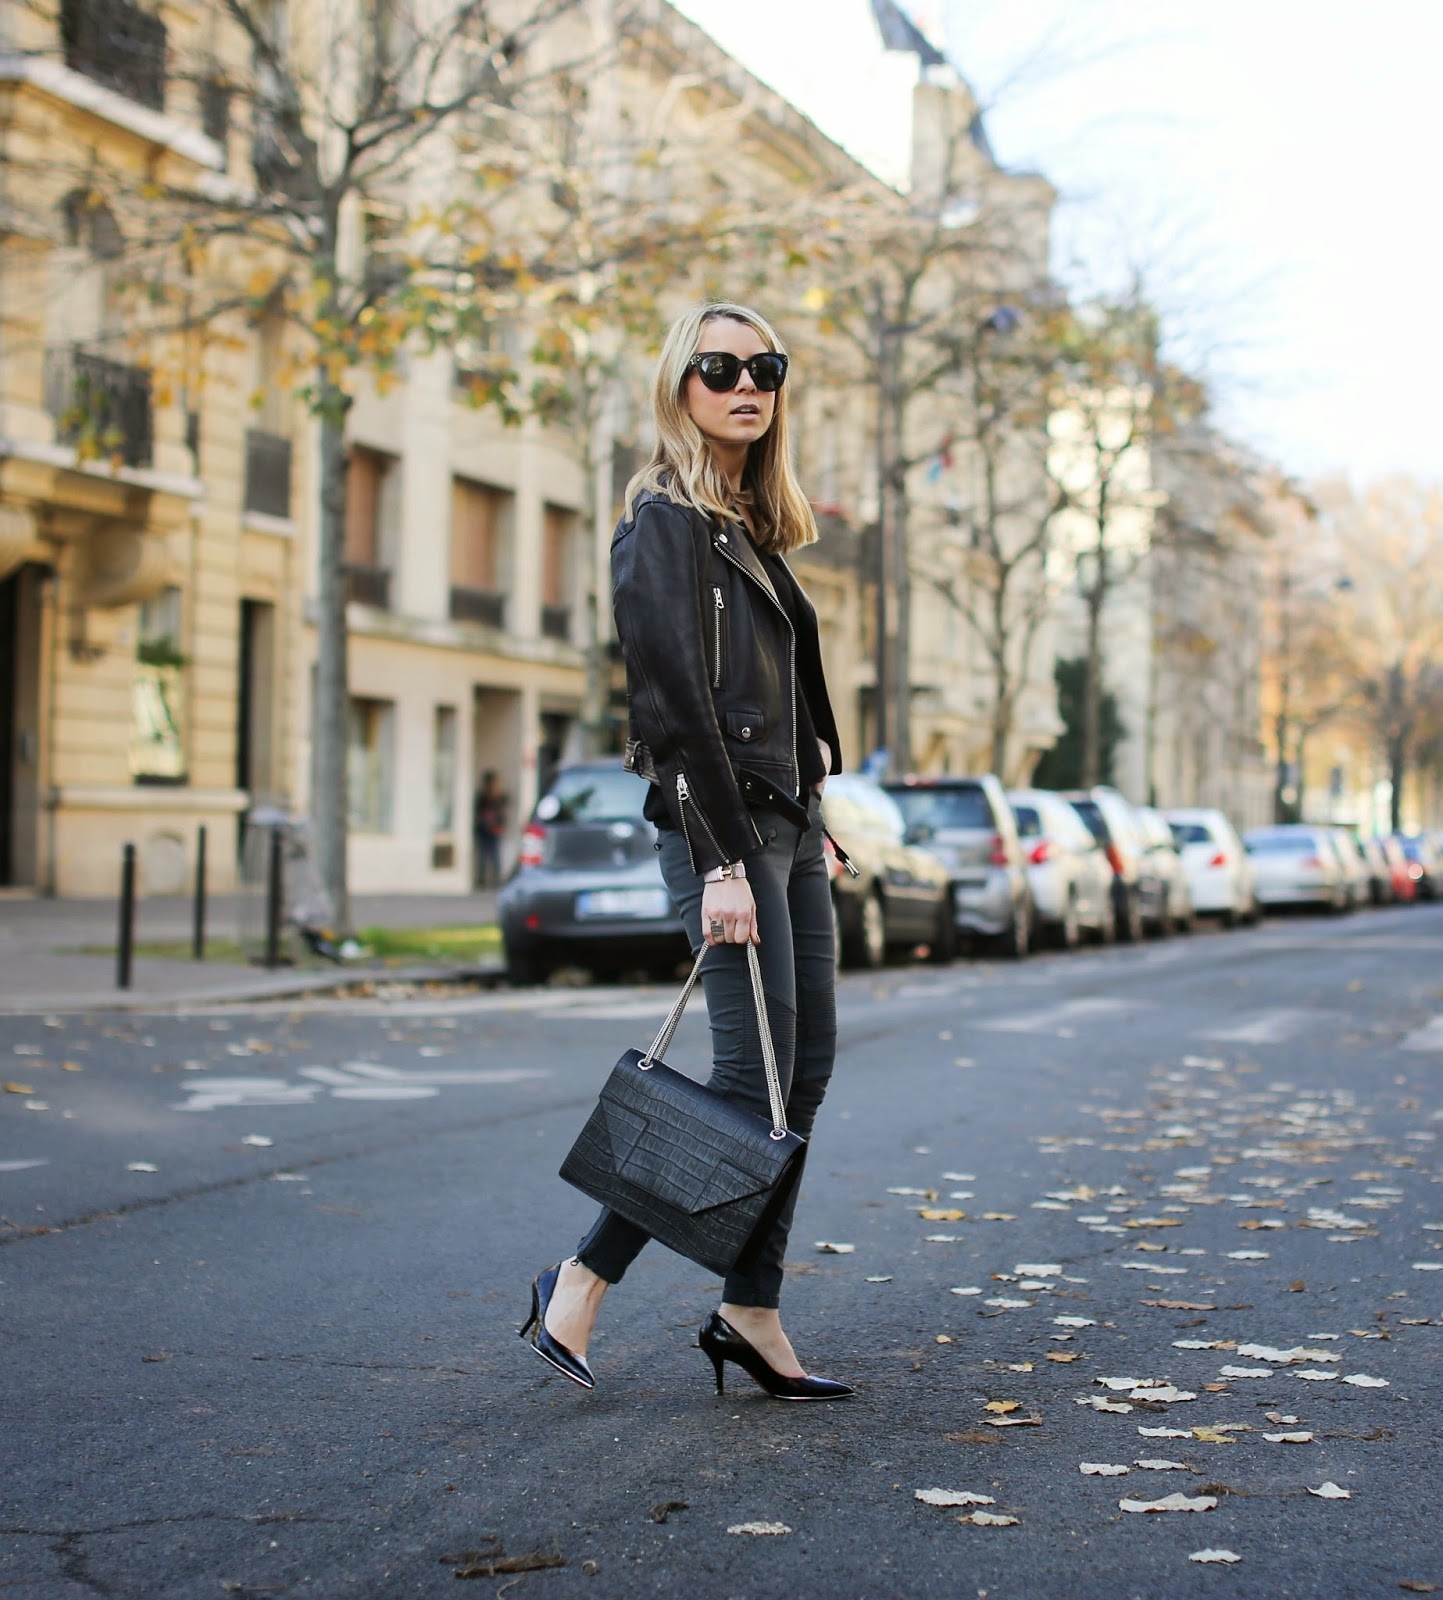 leather jacket, acne studios, perfect jeans, givenchy, saint laurent, edgy, streetstyle, fashion blogger, croc